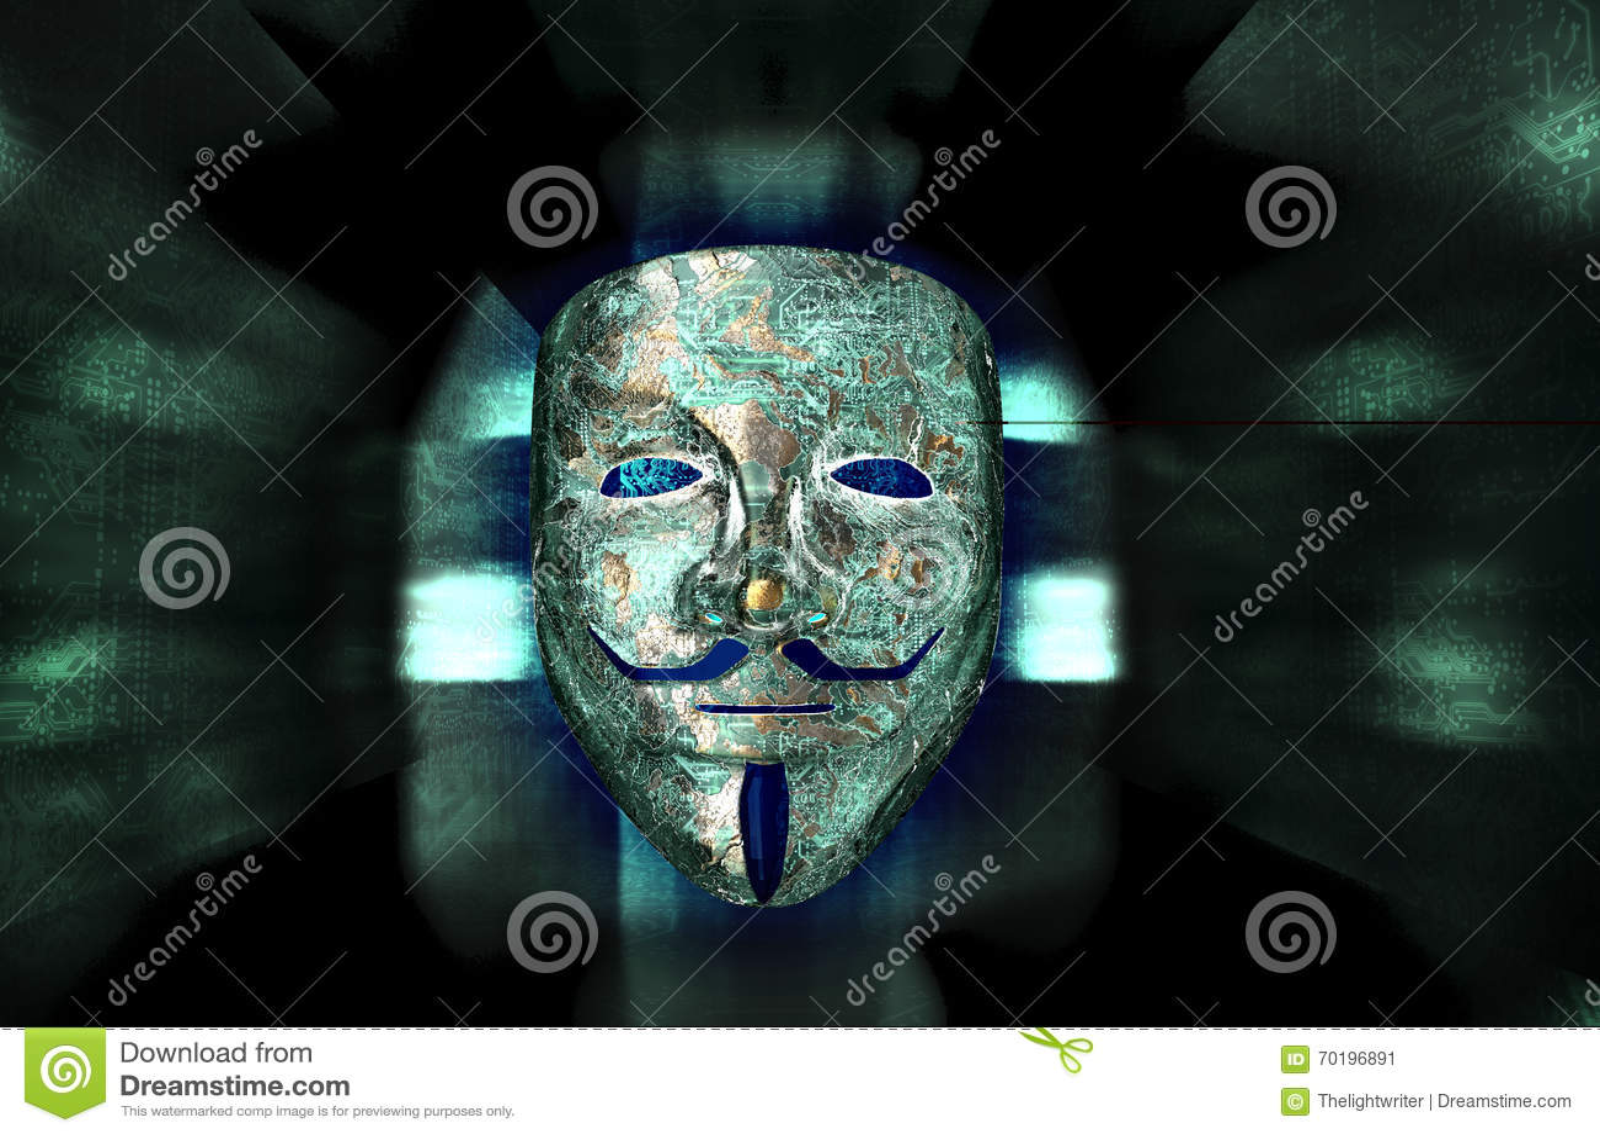 Computer Hacker Symbol Anonymous Mask Stock Illustrations – 48 ...